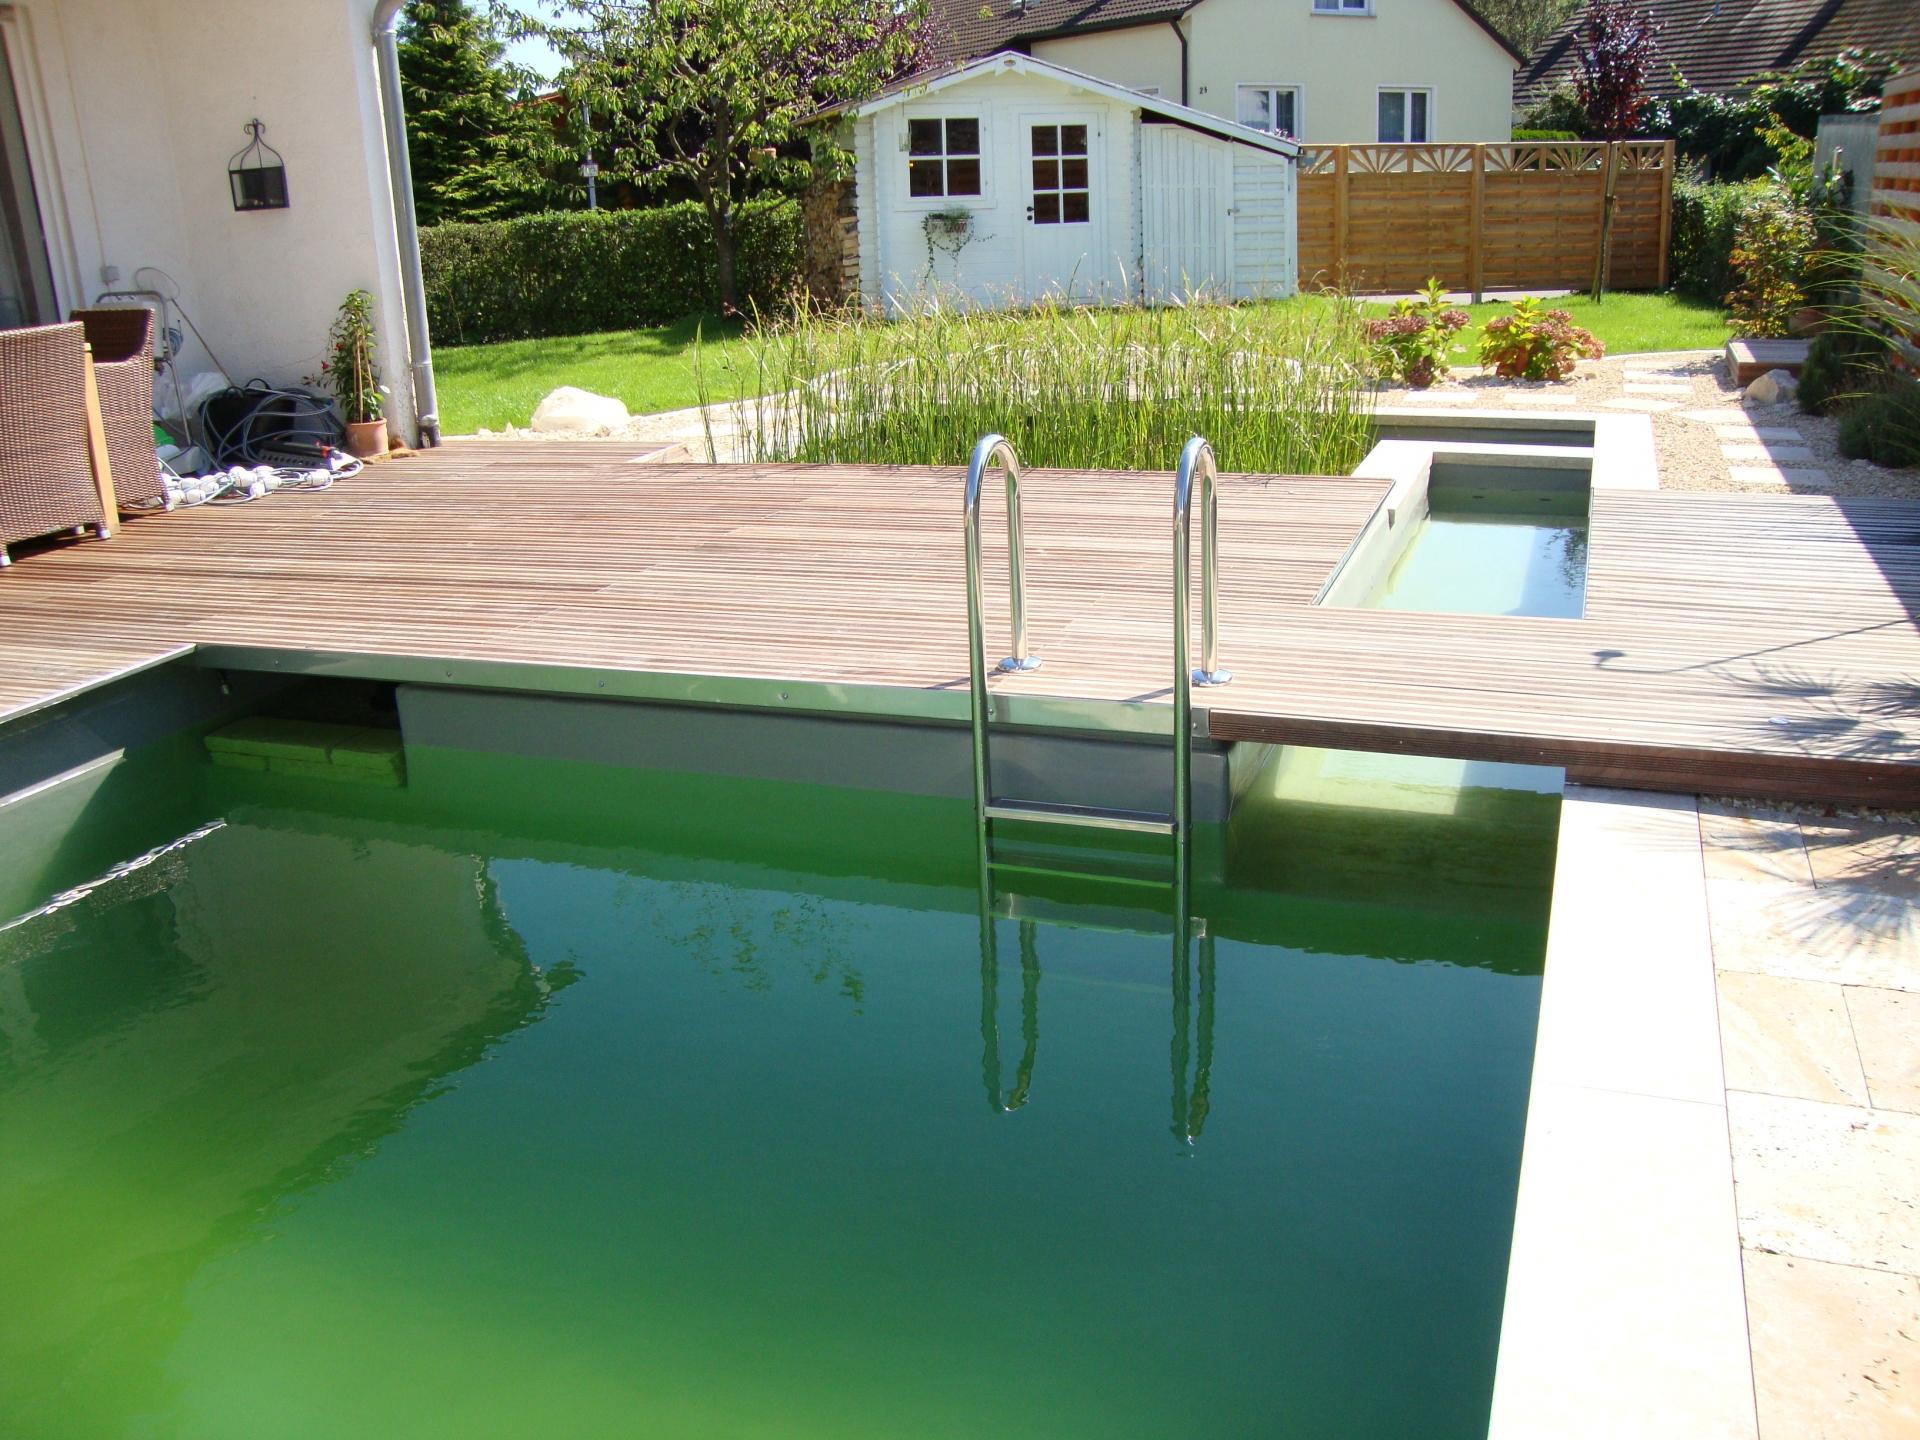 Pool design holz  Geiger's Gartengestaltung & PflanzenweltGartengestaltung ...